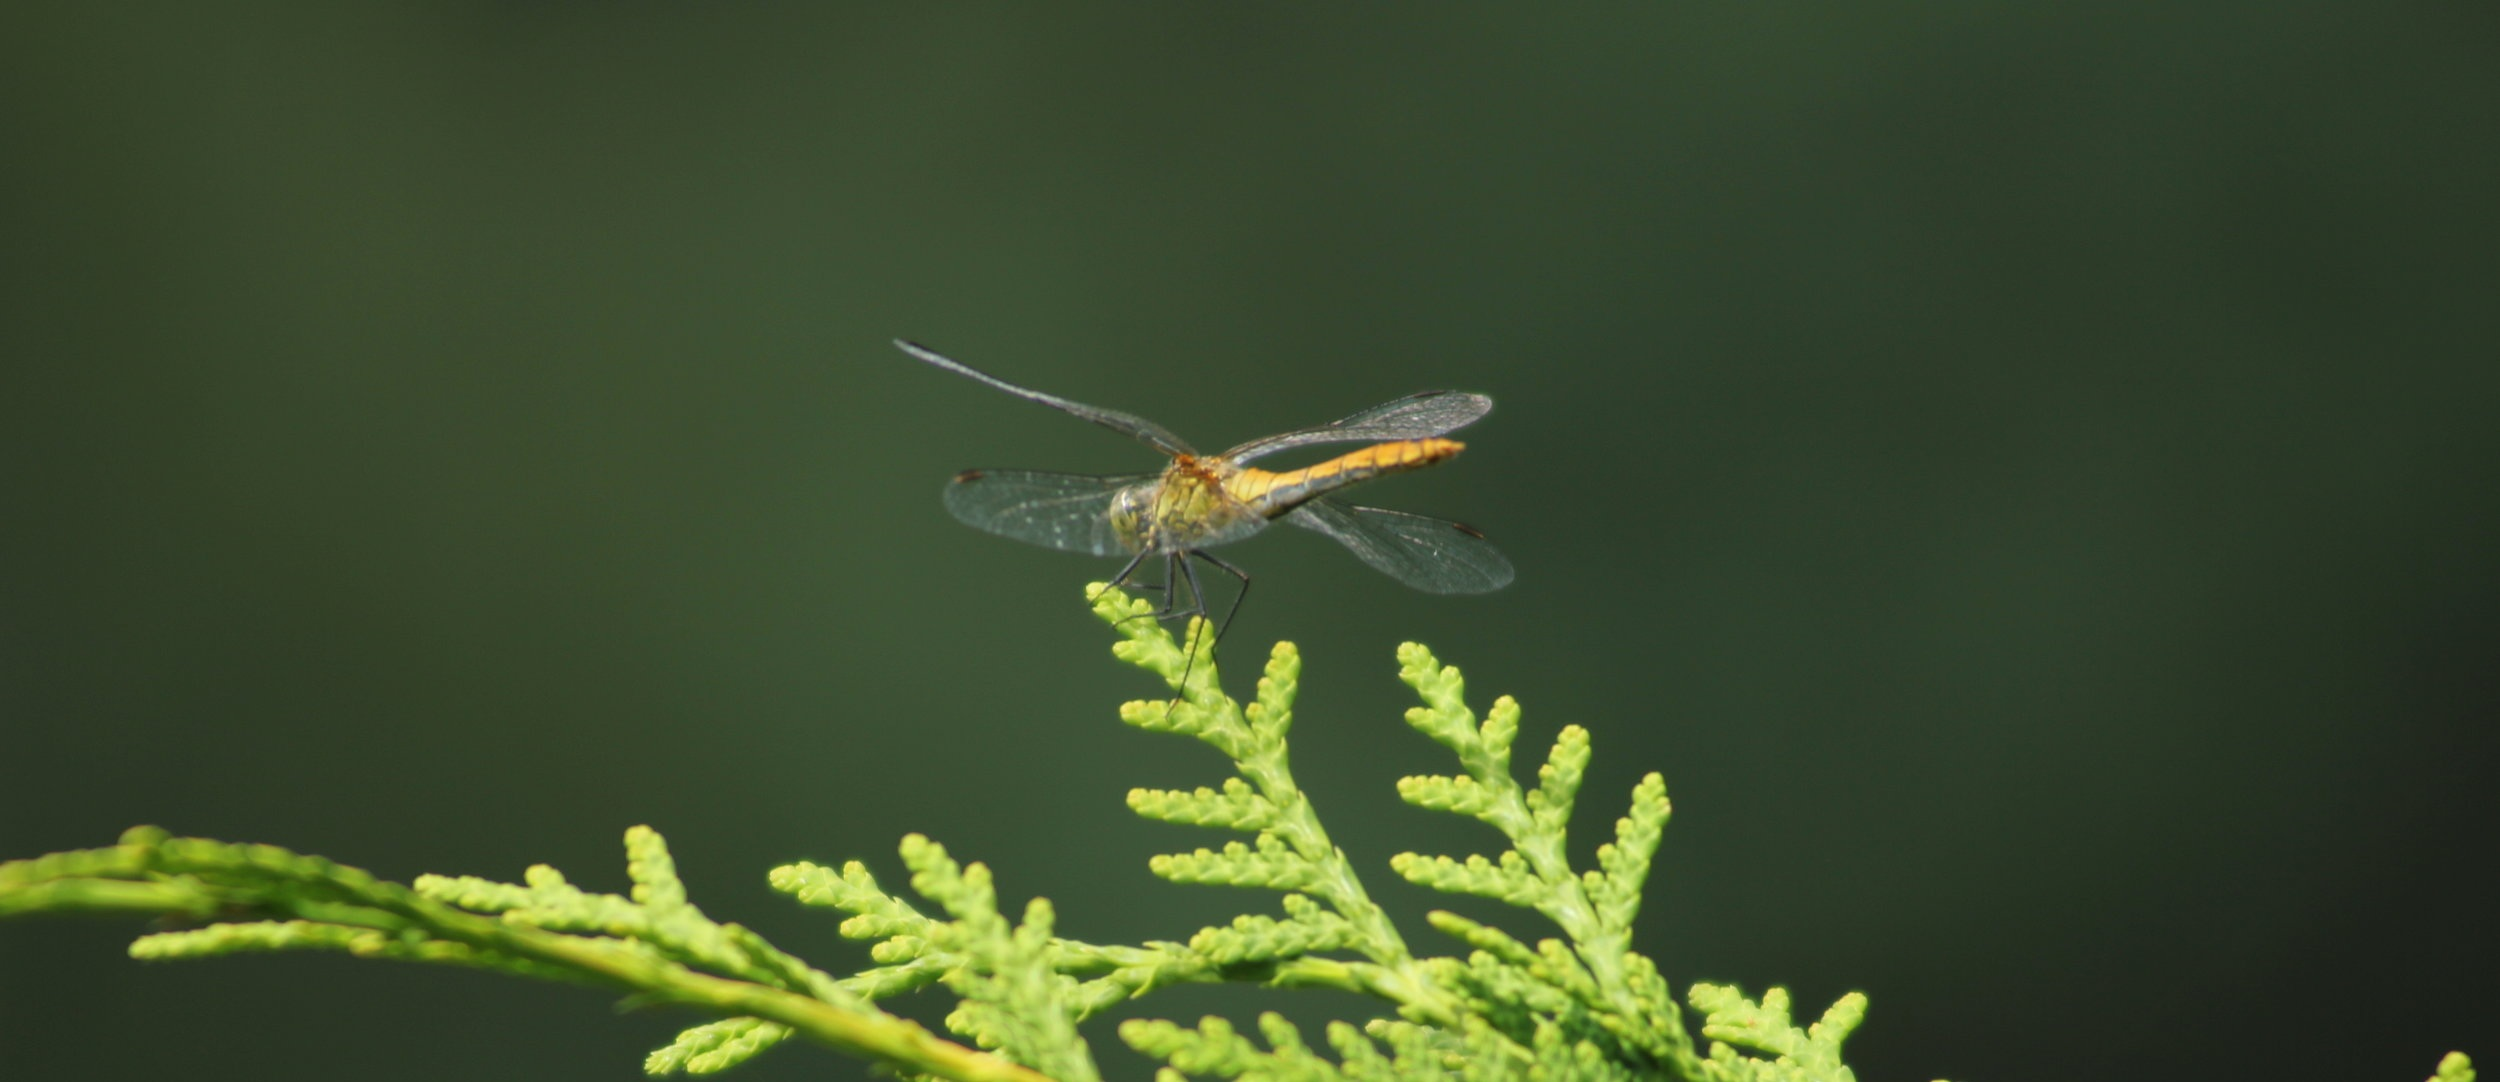 nature-insect-macro-photography-invertebrate-close-up-organism-1425037-pxhere.com.jpg